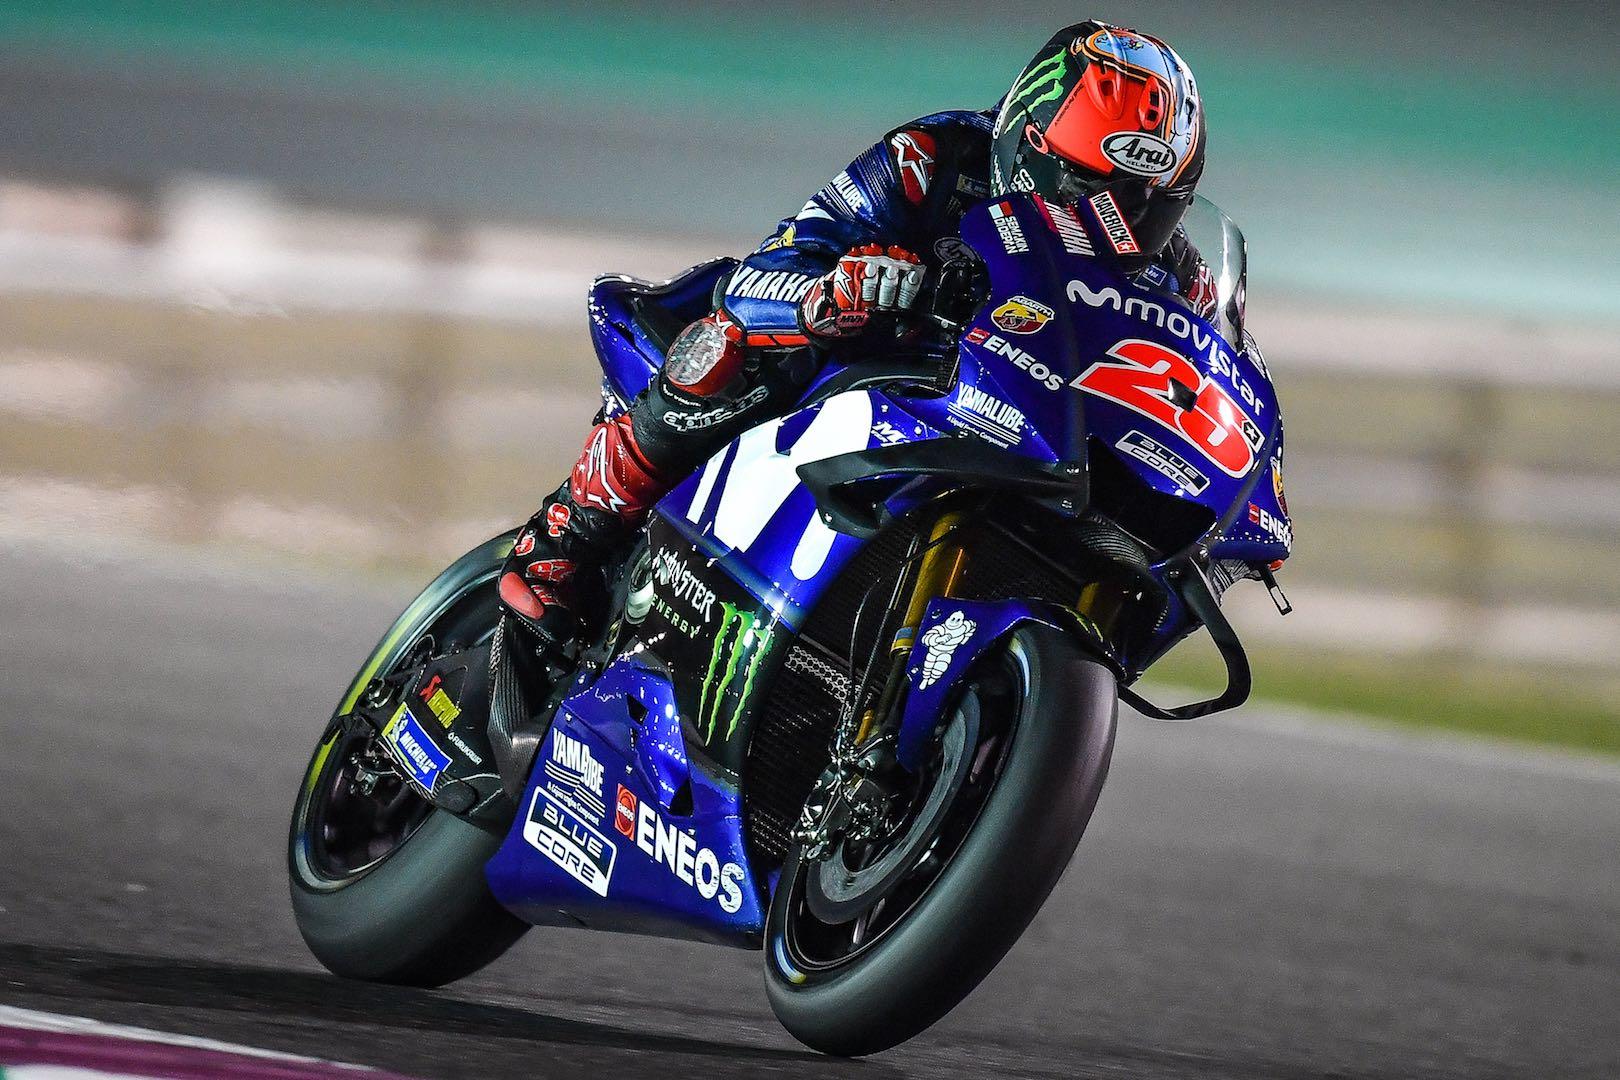 2018 Qatar Motogp Test Day 1 Yamaha S Vinales Just Tops Ducati S